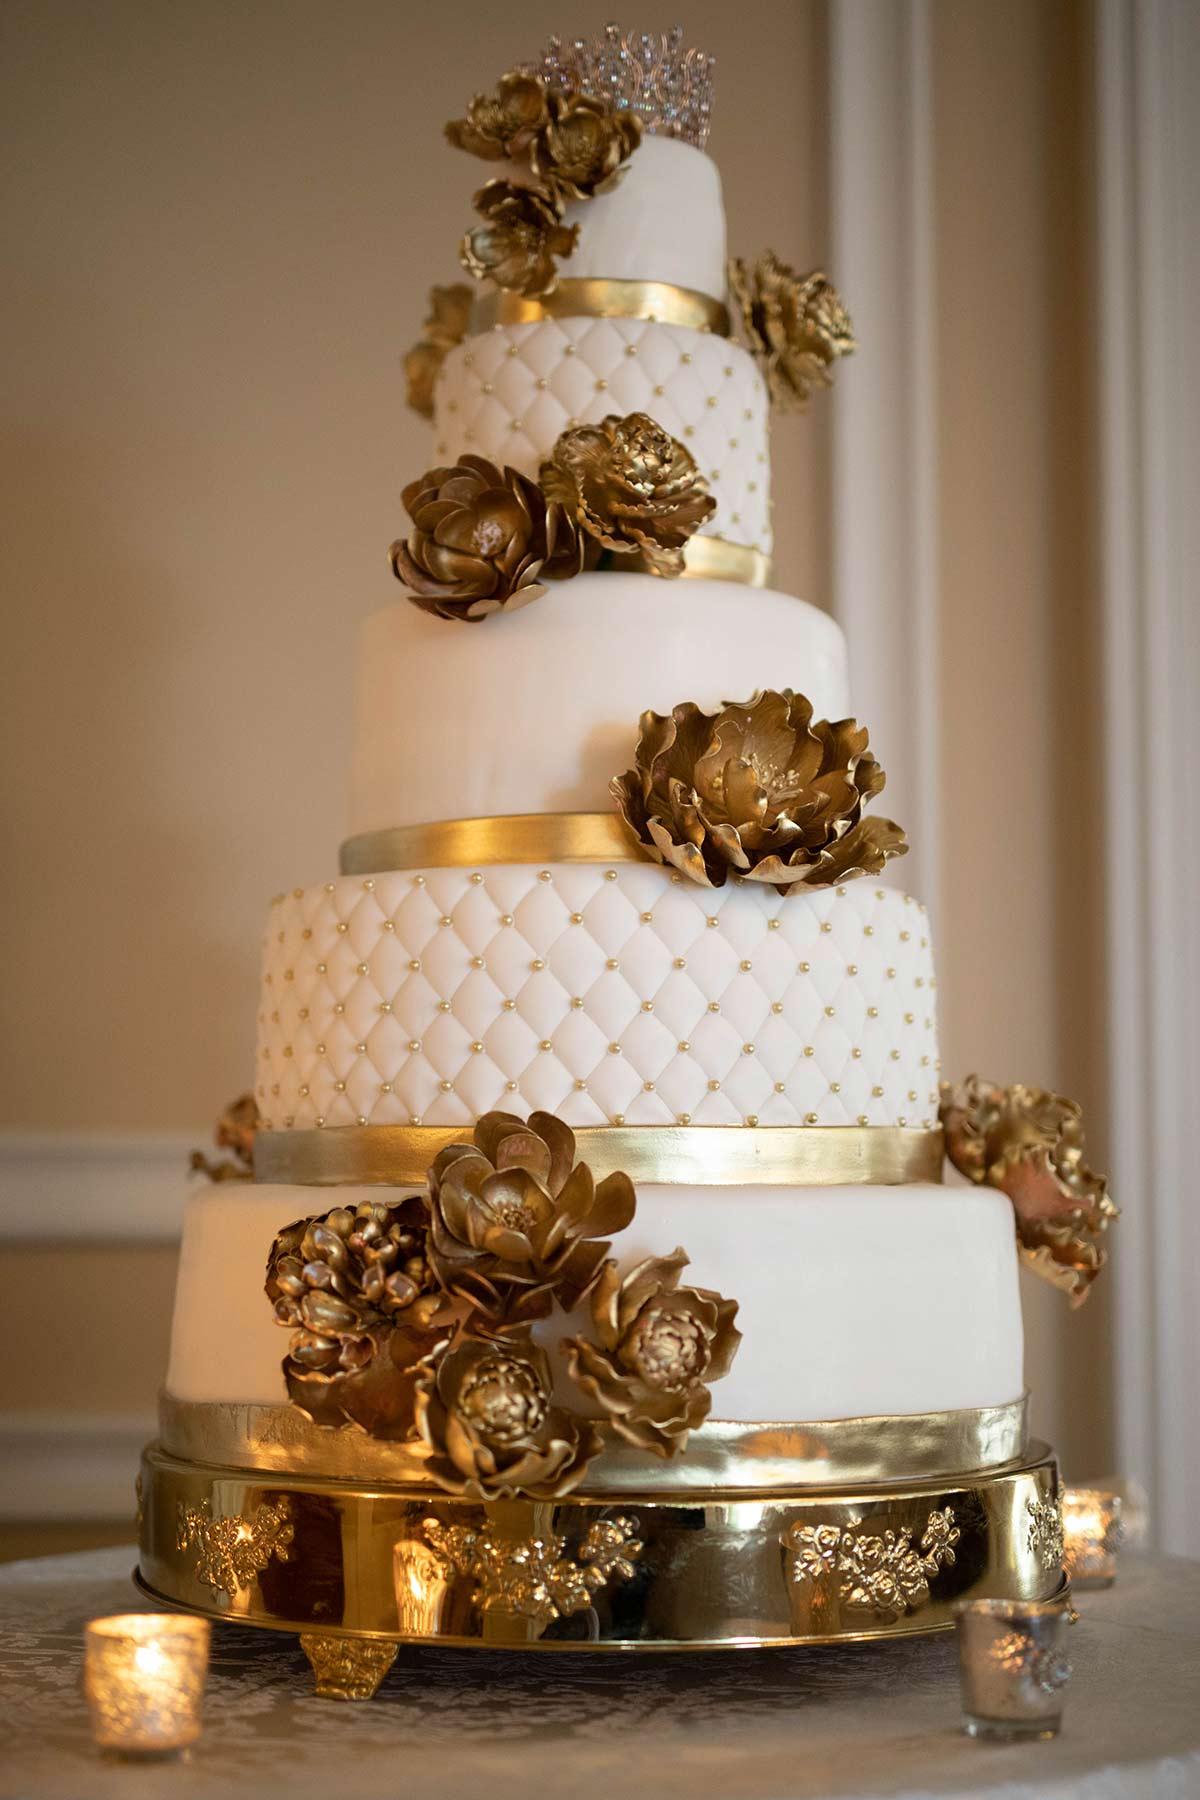 27_Dan_Andreotti_cake_at_Oheka_Castle.JPG